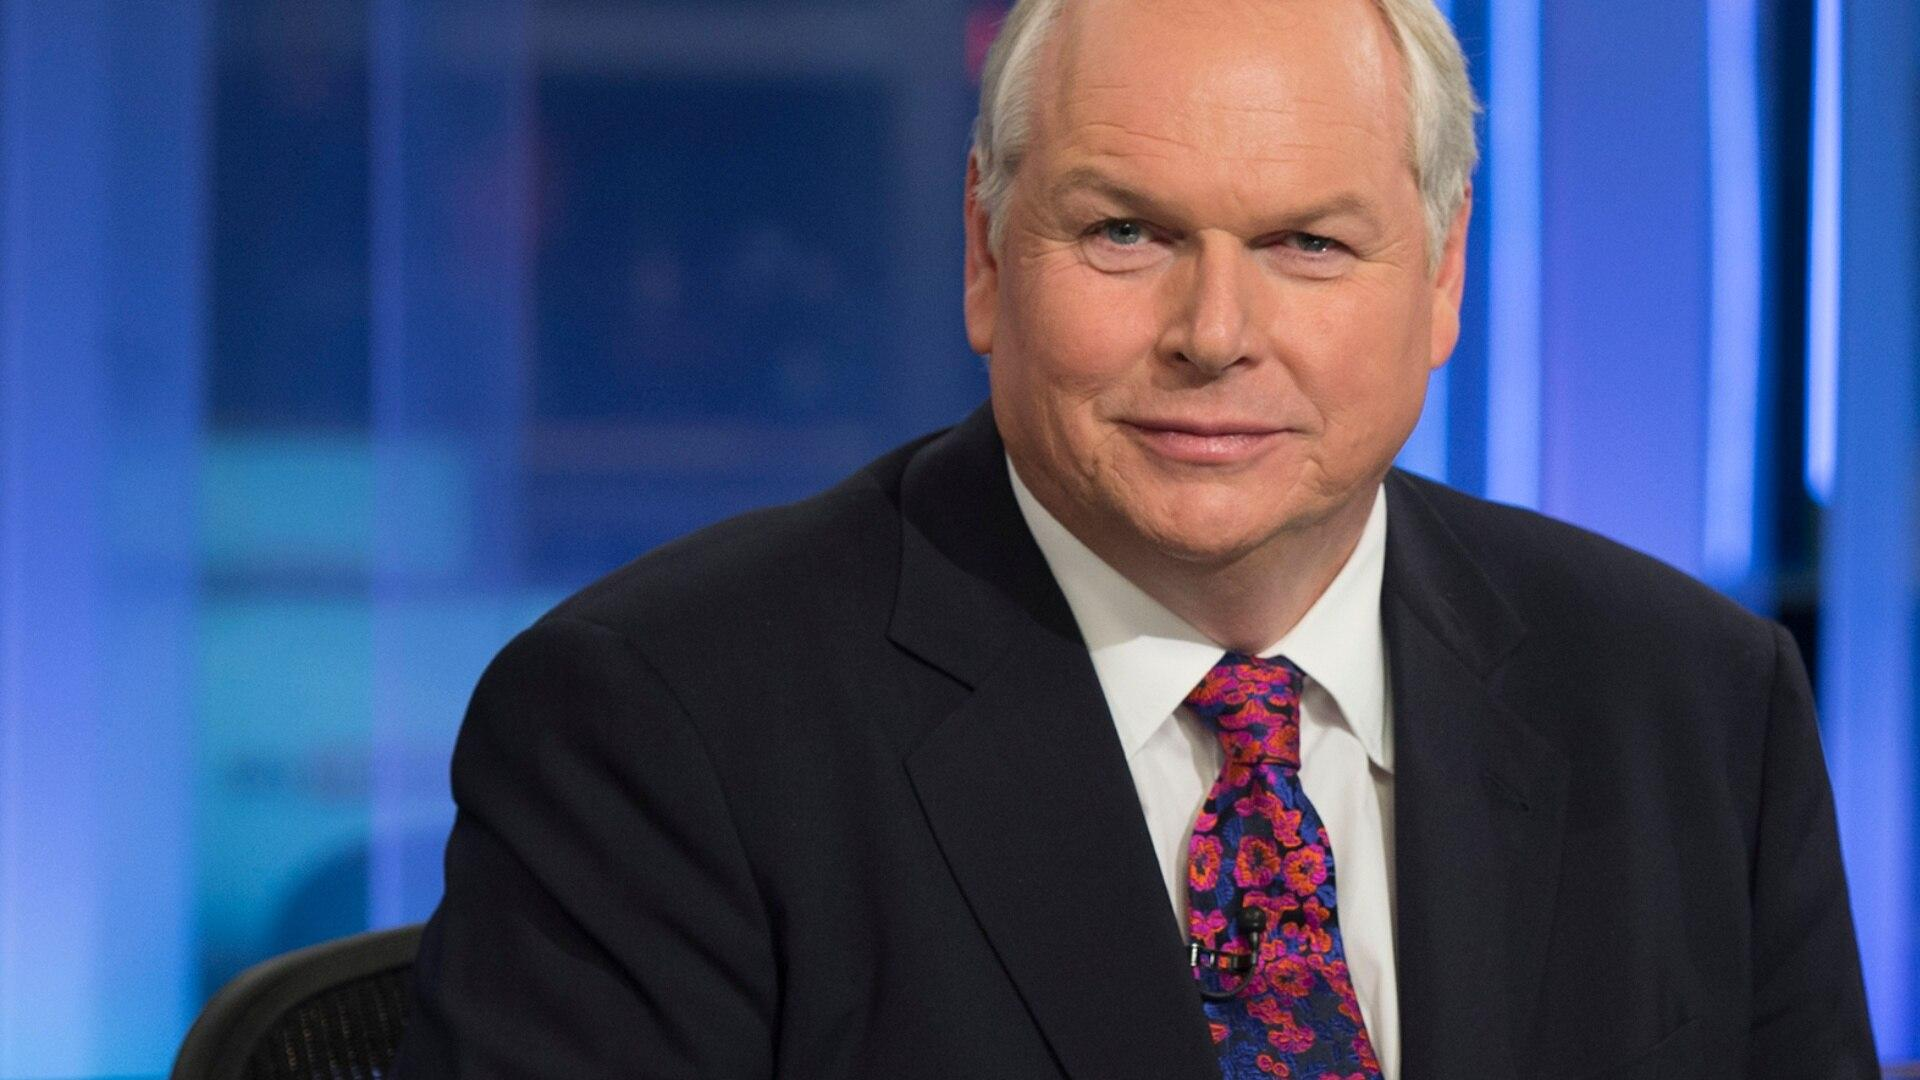 Sky News All Out Politics